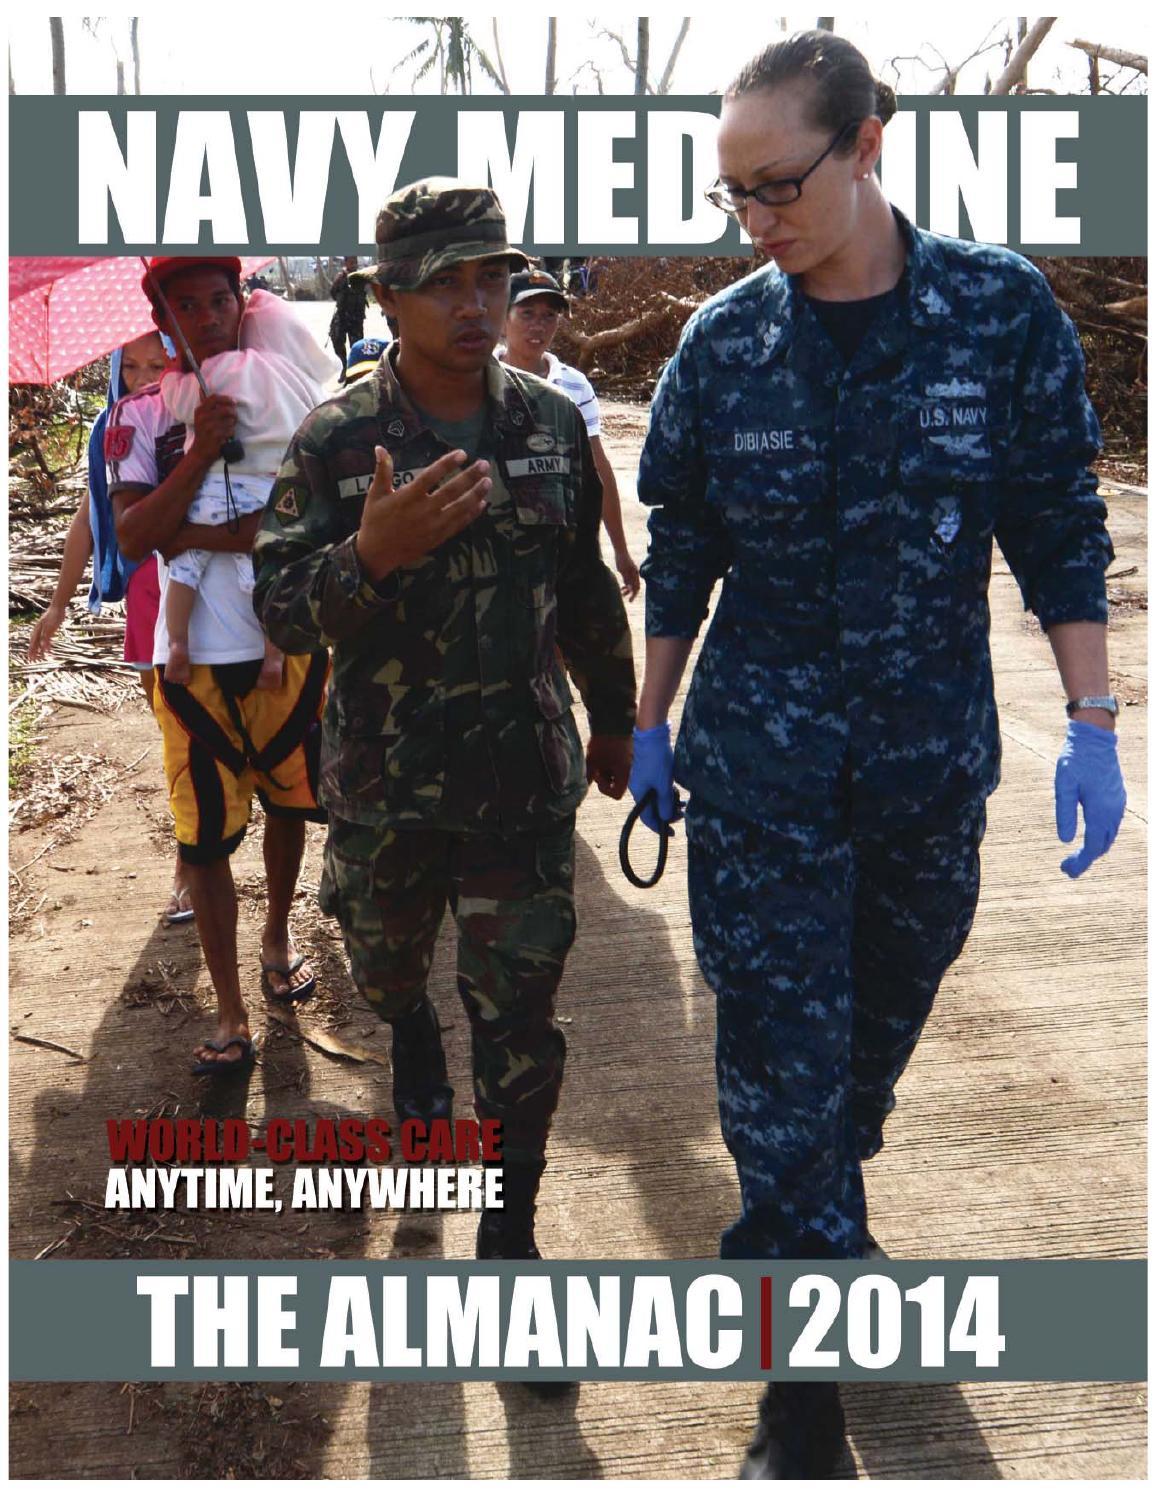 Bethesda naval medical center clipart #4